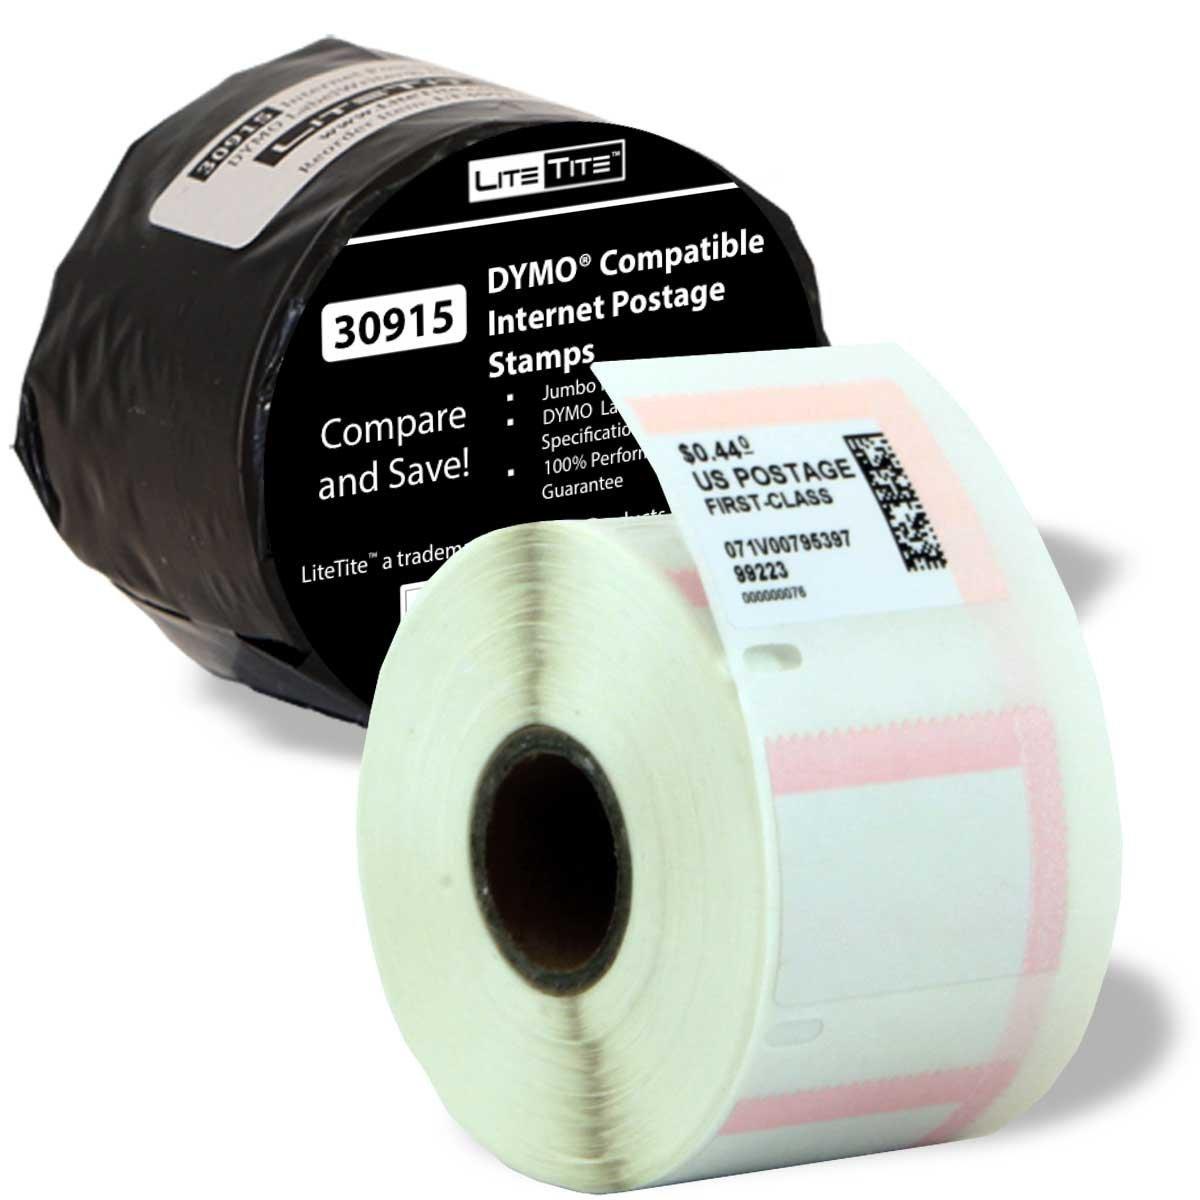 Buy LiteTite 30915-Jumbo (1 Roll) DYMO LabelWriter (LW